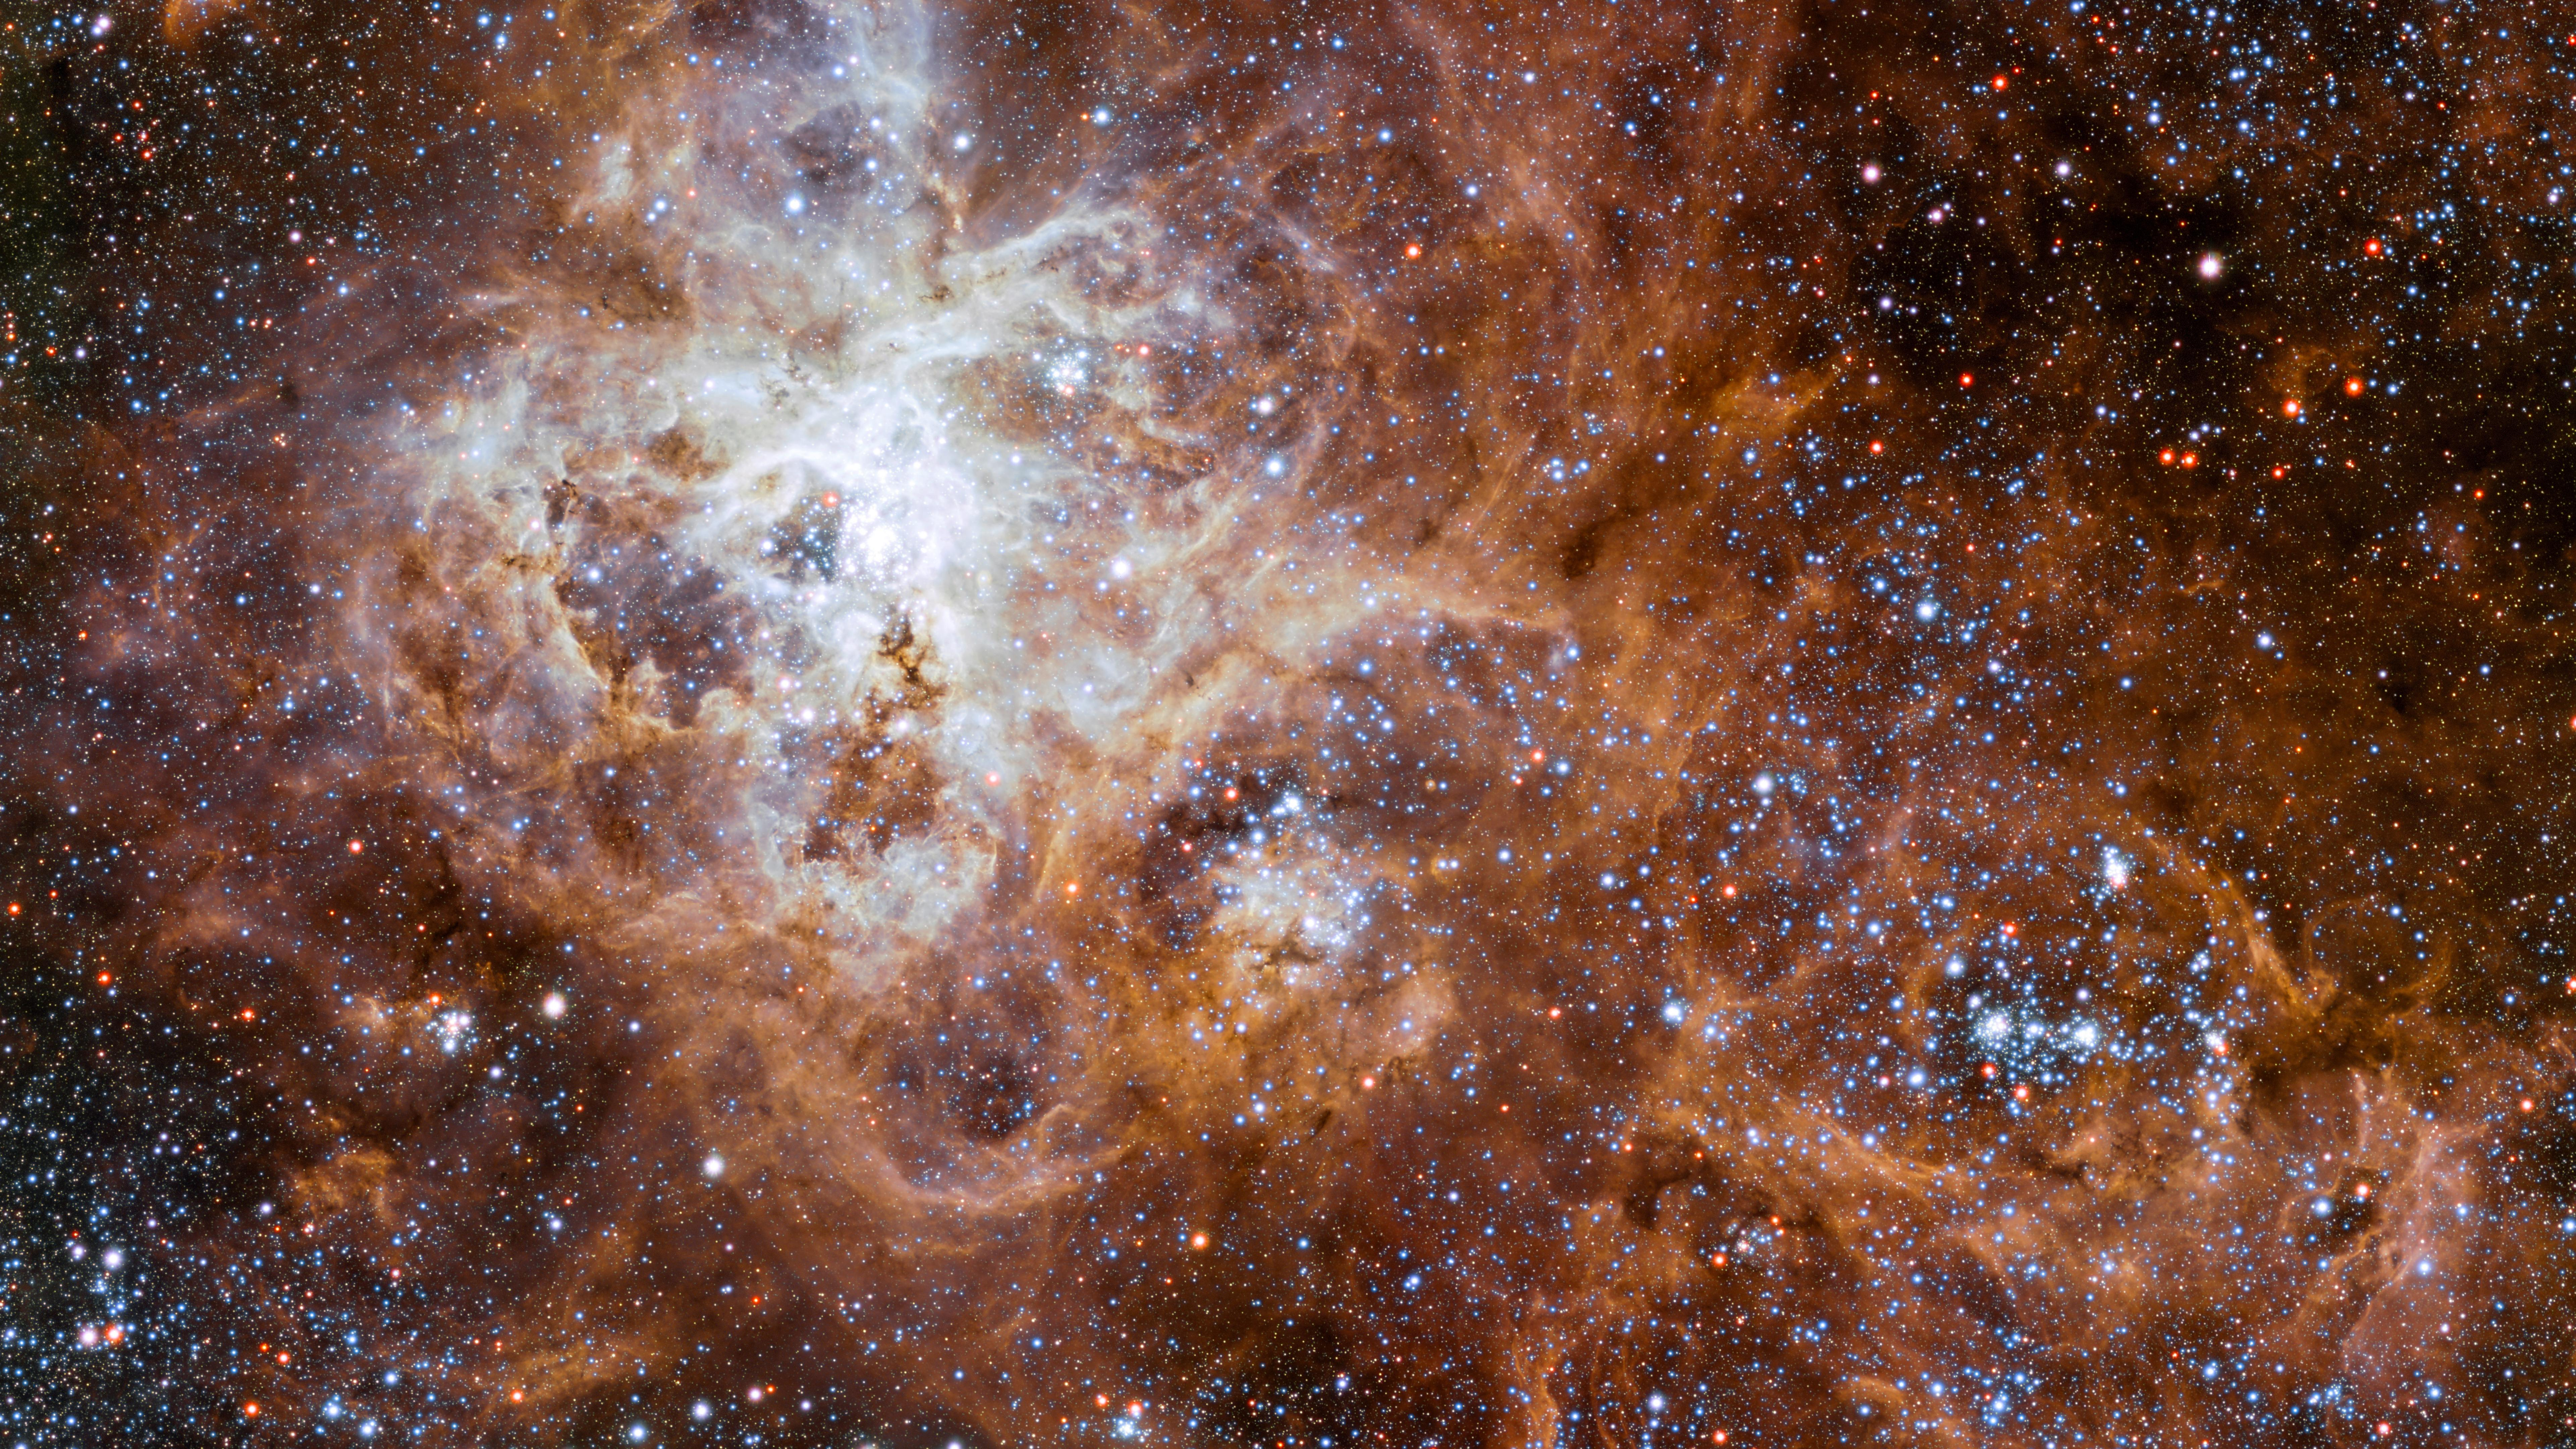 The Tarantula Nebula in the Large Magellanic Cloud wallpaper